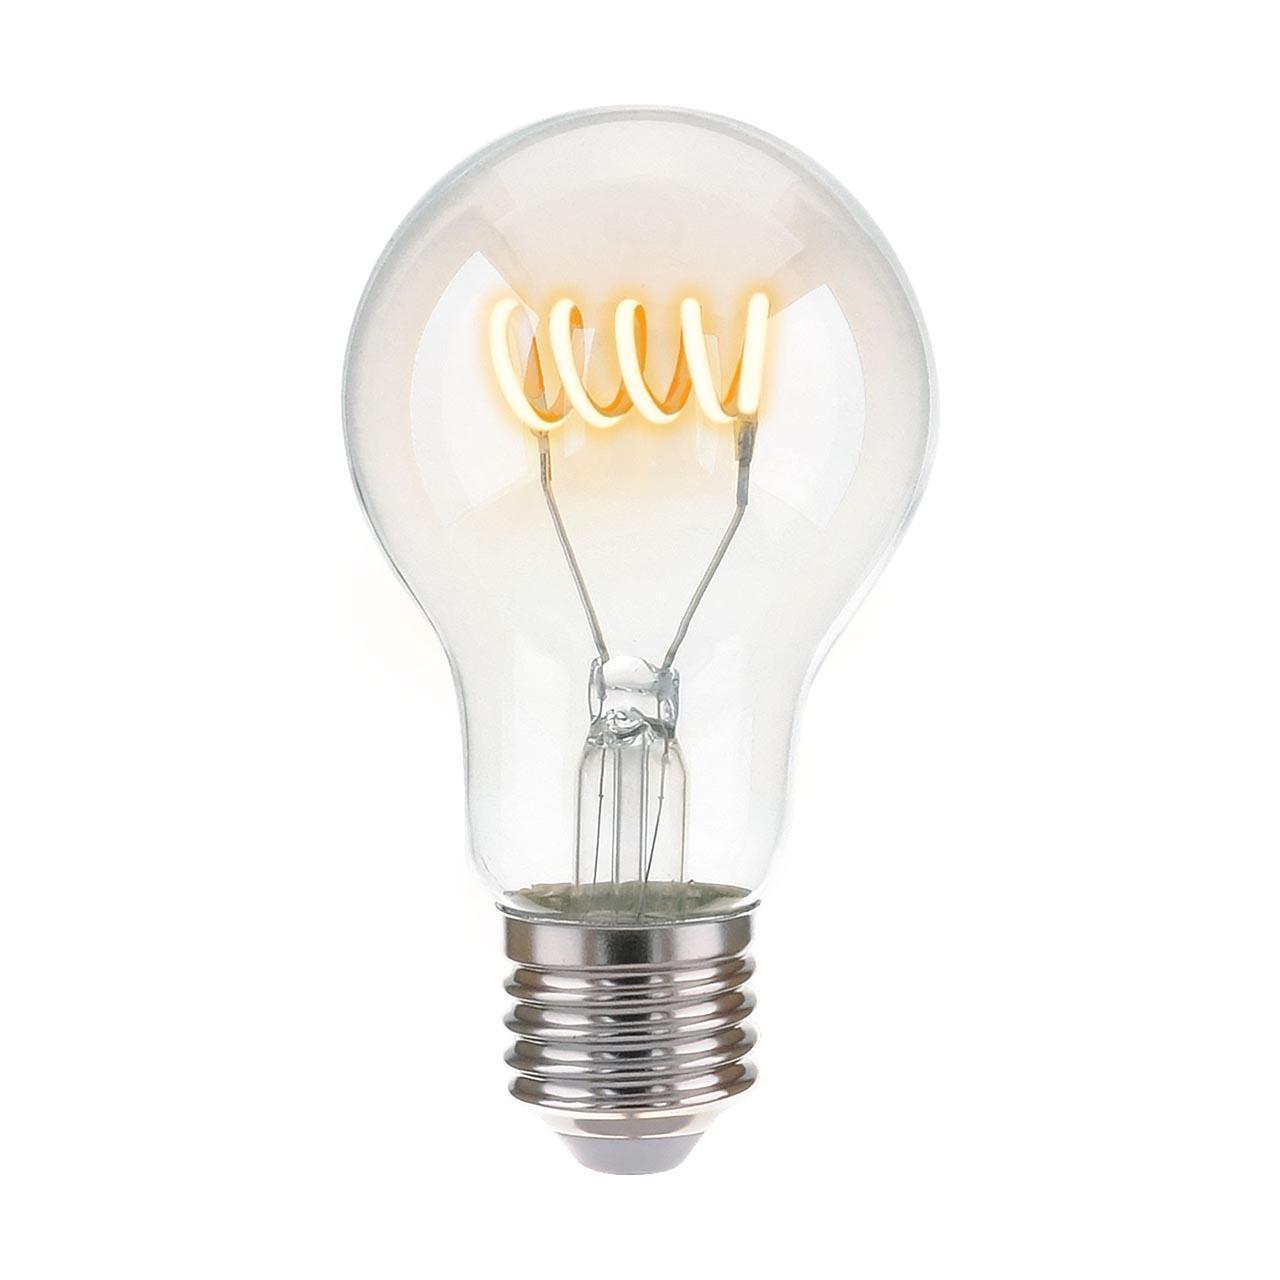 elektrostandard лампа светодиодная elektrostandard classic led d 10w 4200k e27 4690389085543 Лампа светодиодная E27 6W 4200K прозрачная 4690389125249